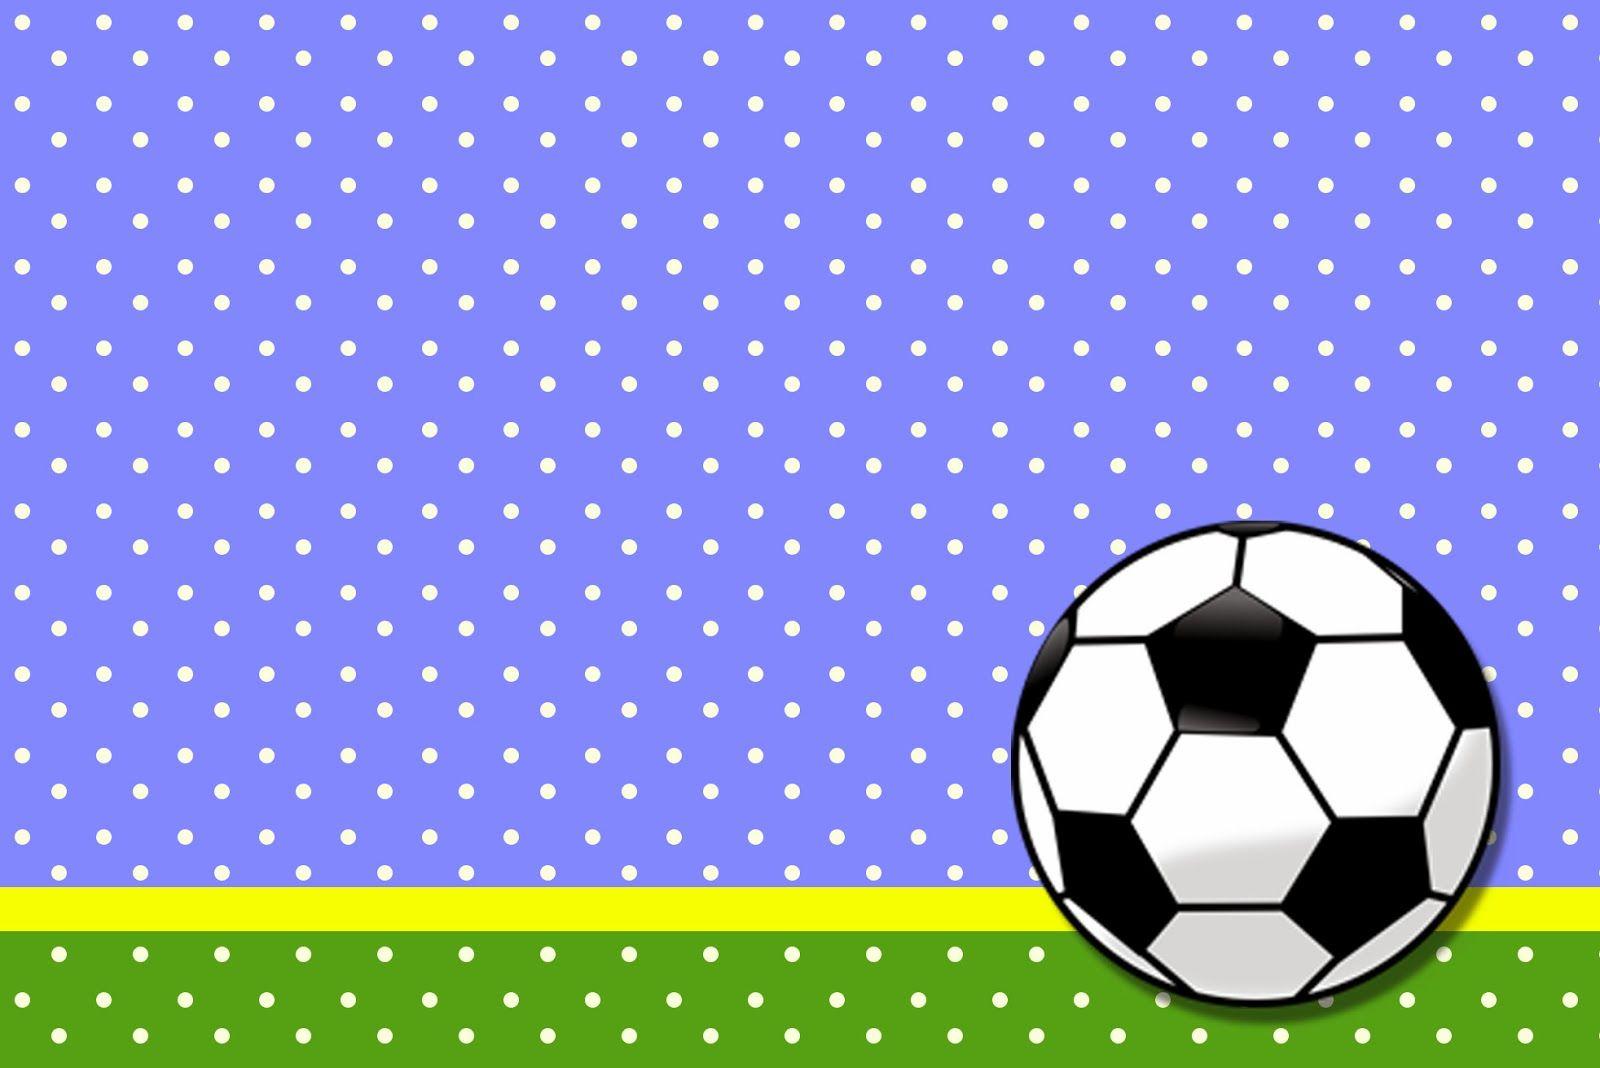 Fútbol Tarjetas o Invitaciones para Imprimir Gratis Papeles Pinterest Scrap